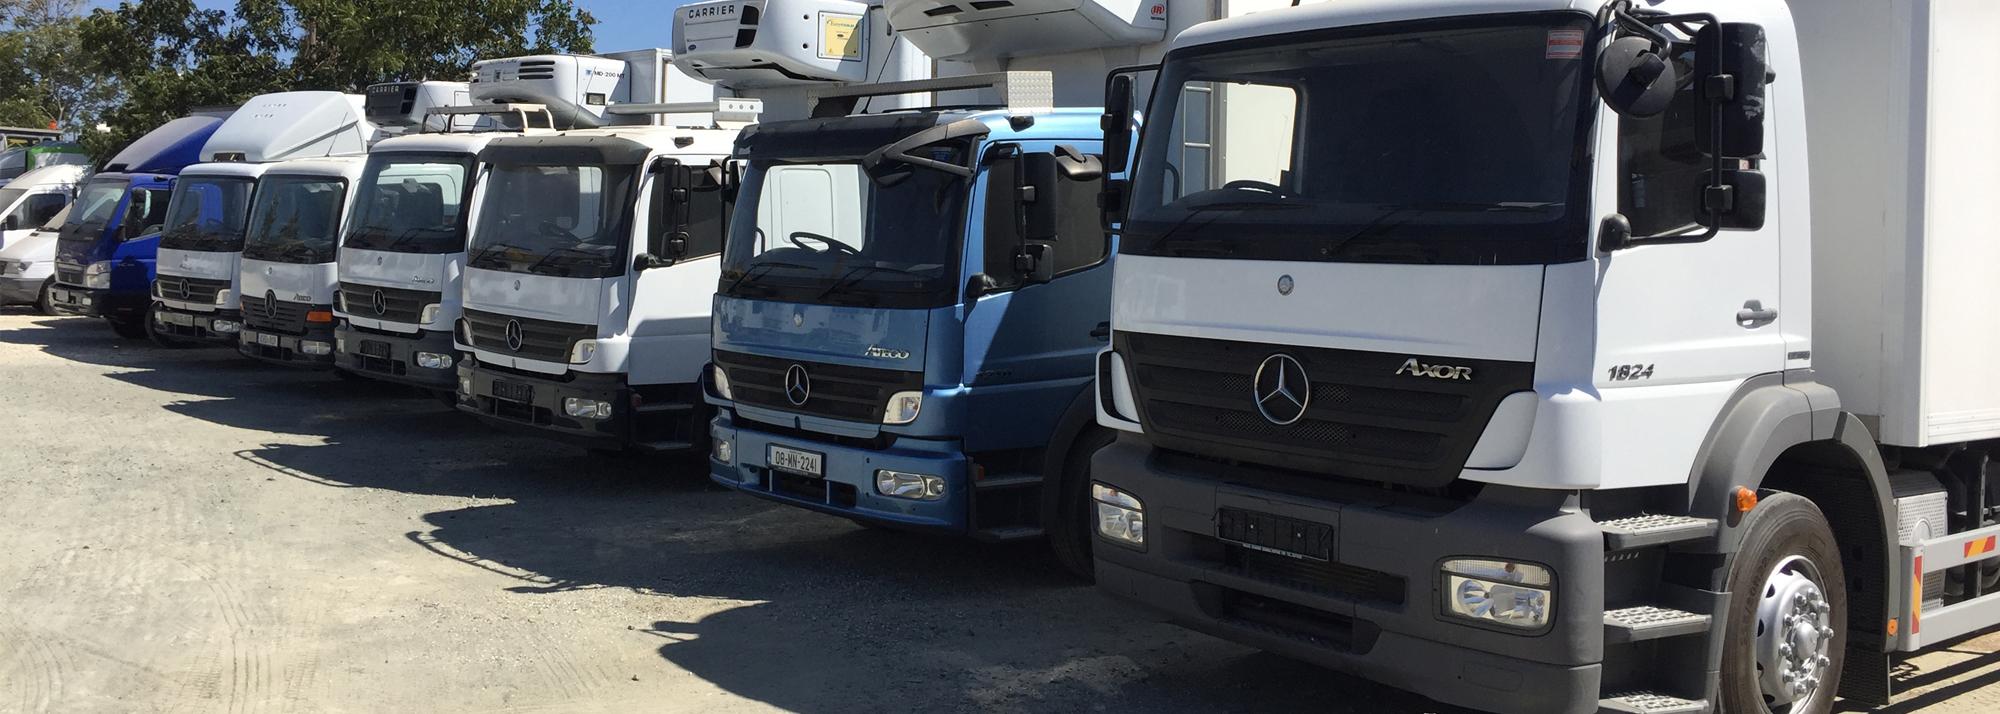 Pavlos Zenonos General Motors Used Vans Trucks For Sale In Cyprus Limassol Nicosia